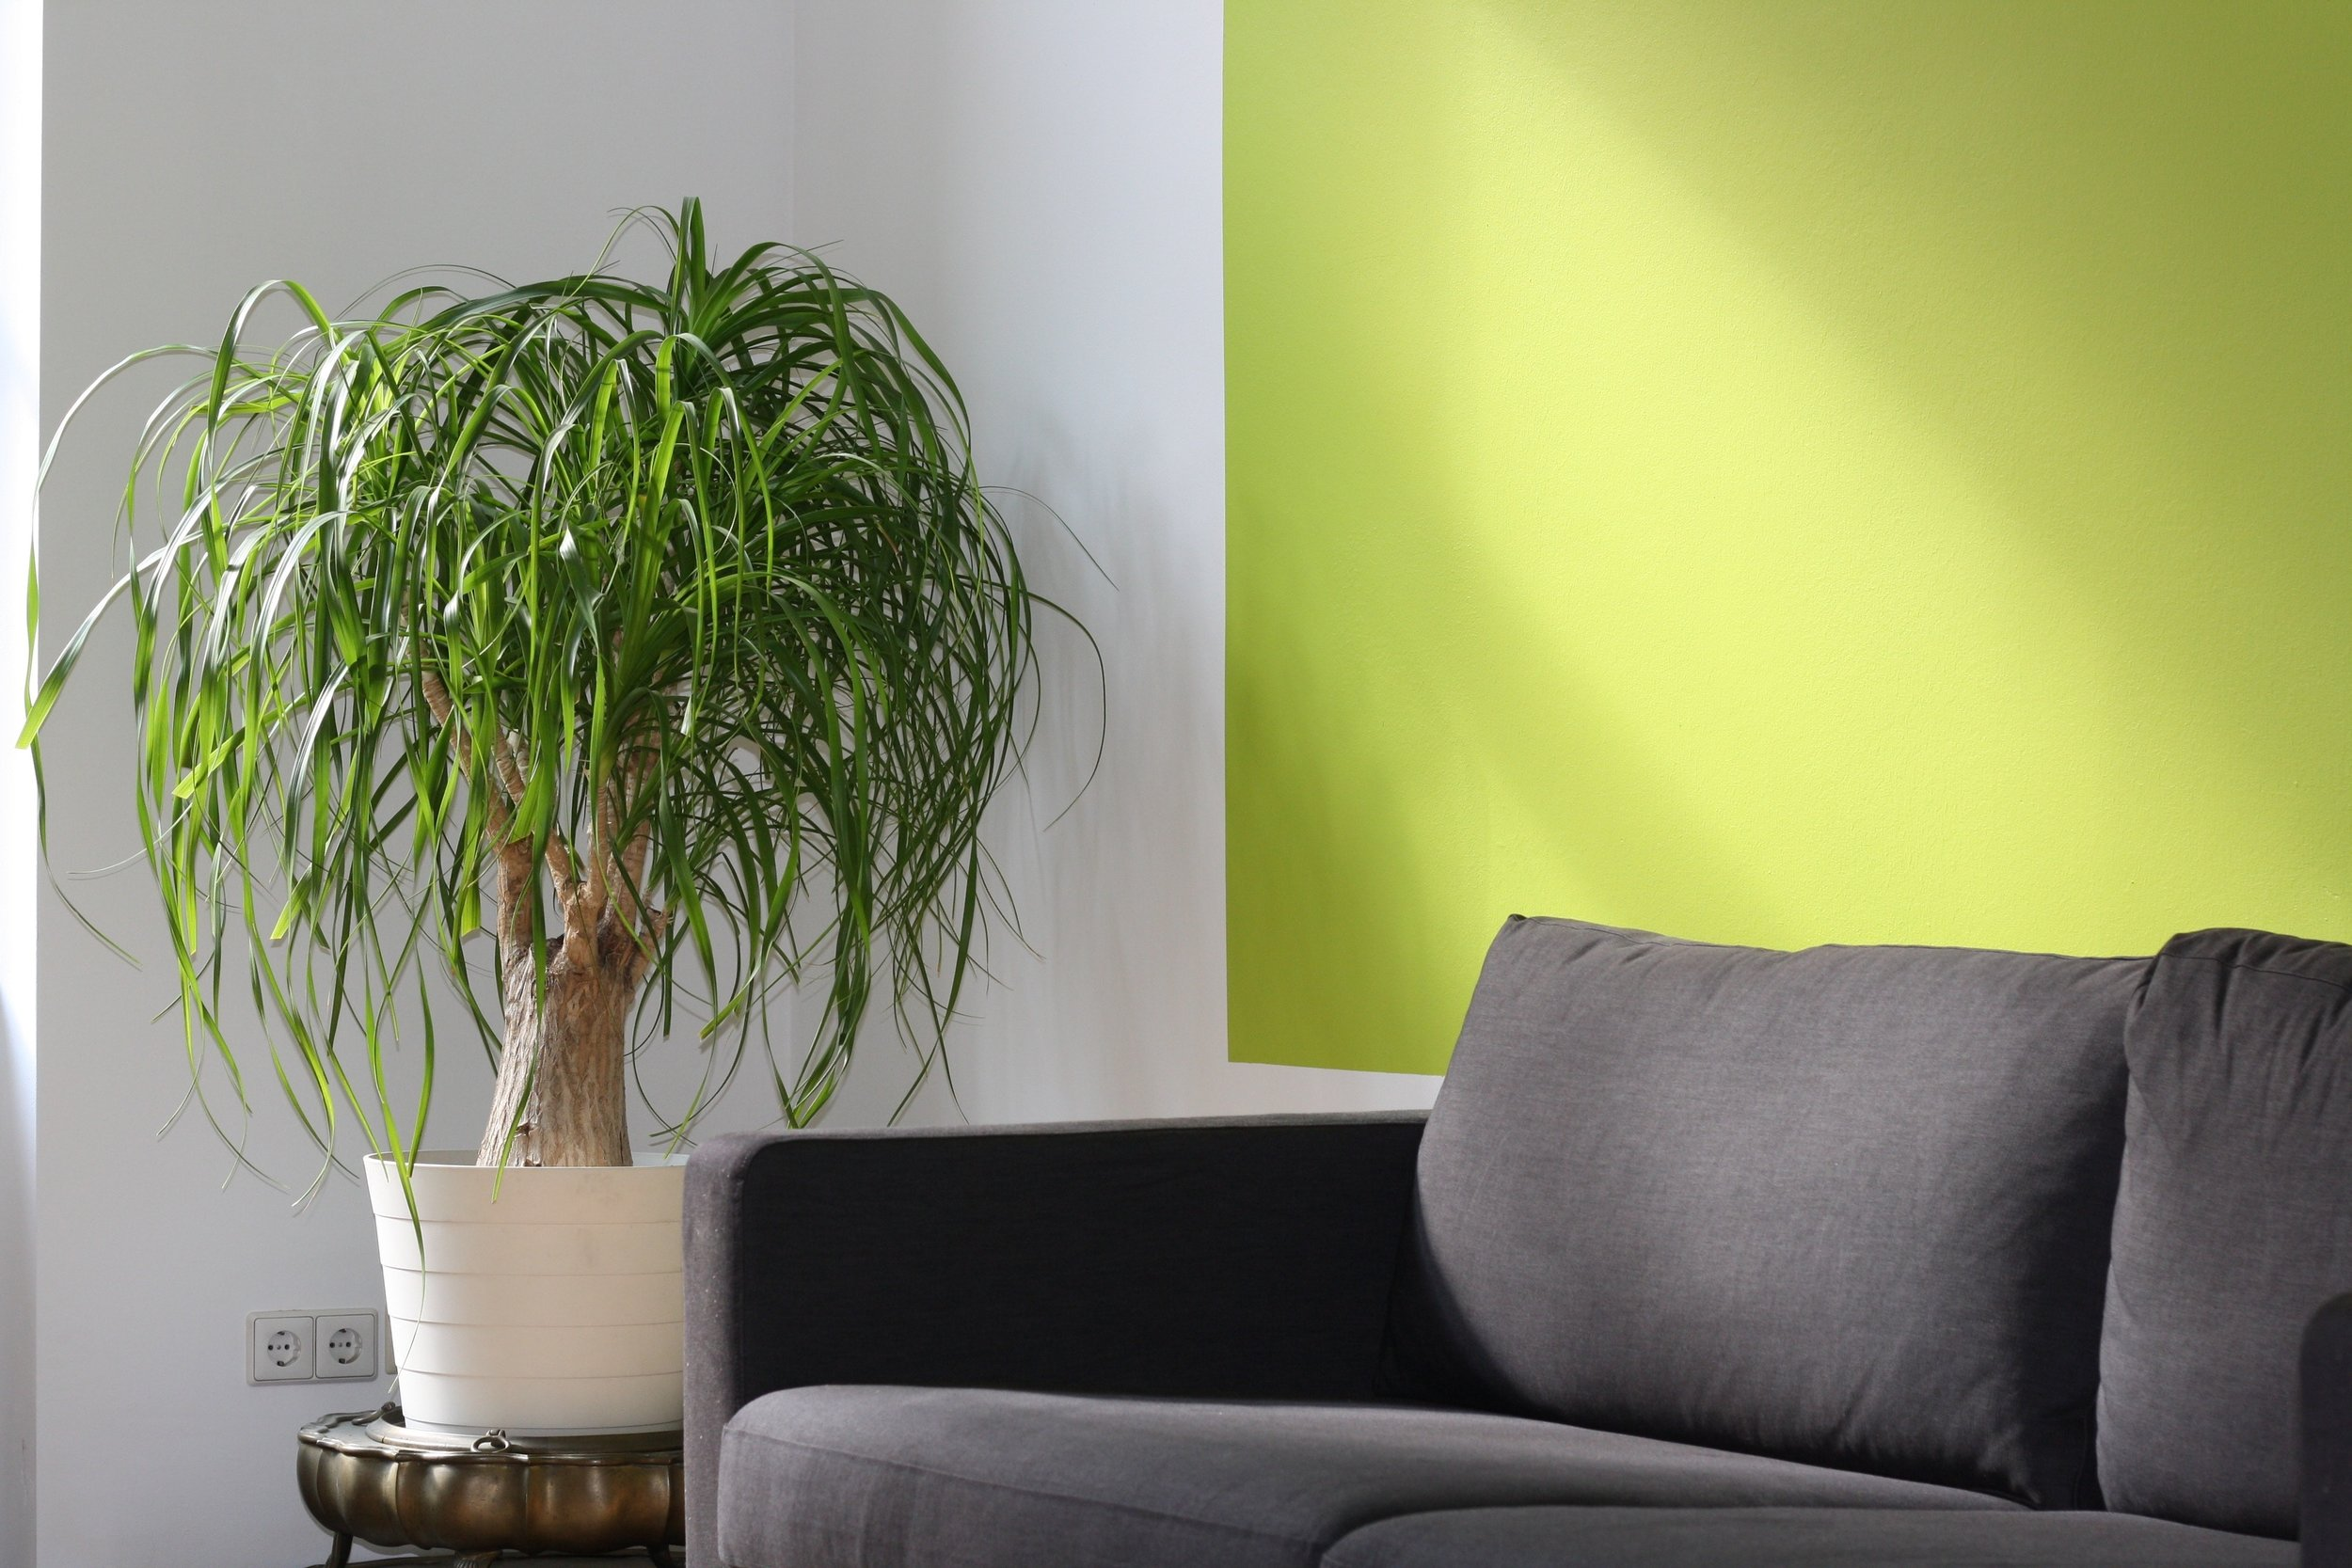 apartment-comfort-contemporary-260046.jpg